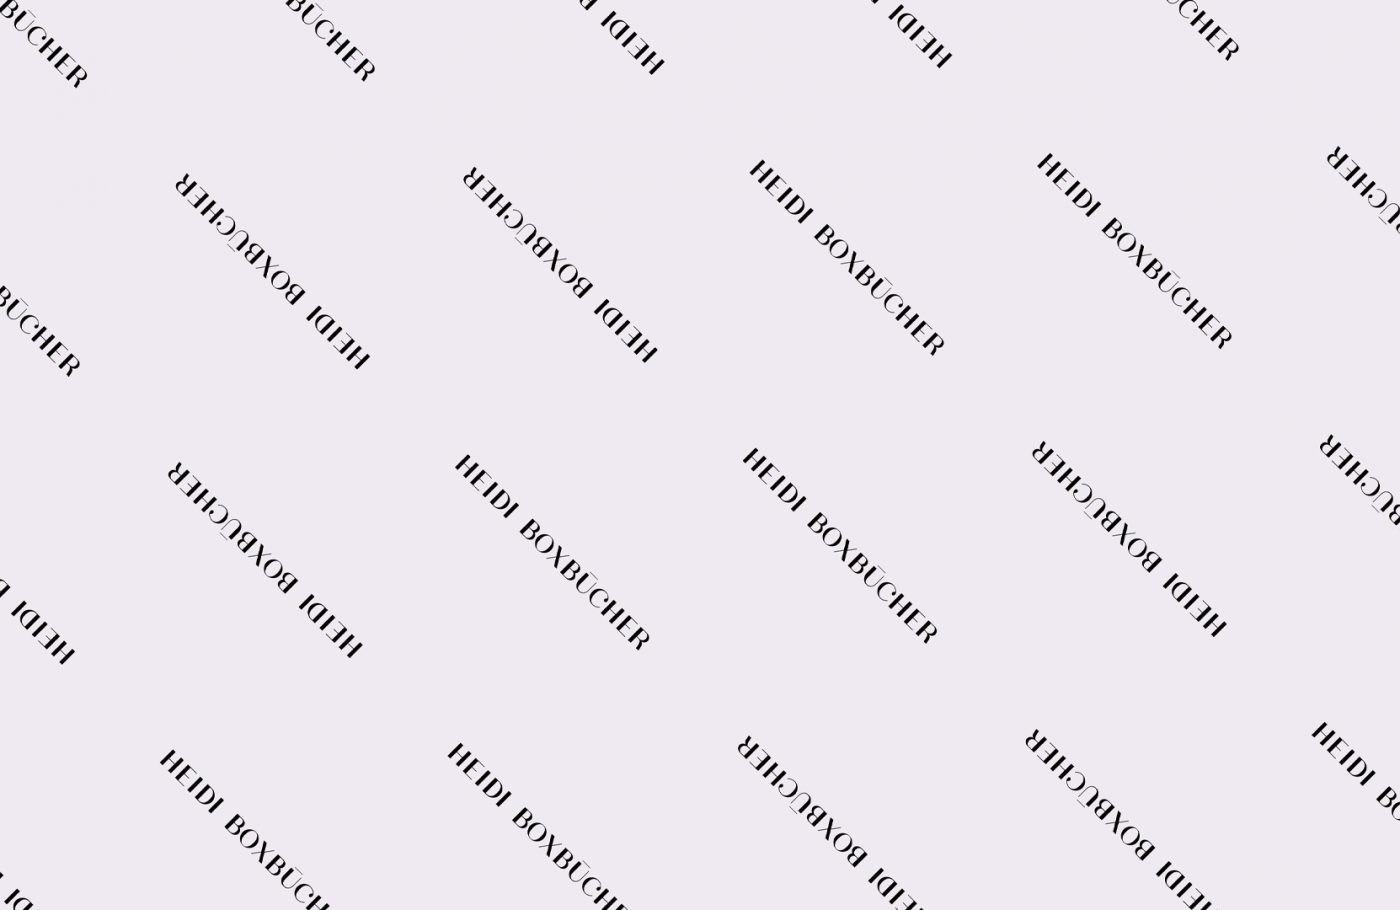 GSVI_HeidiBoxbuecherJuwelier_Branding_hero_1920x1080px